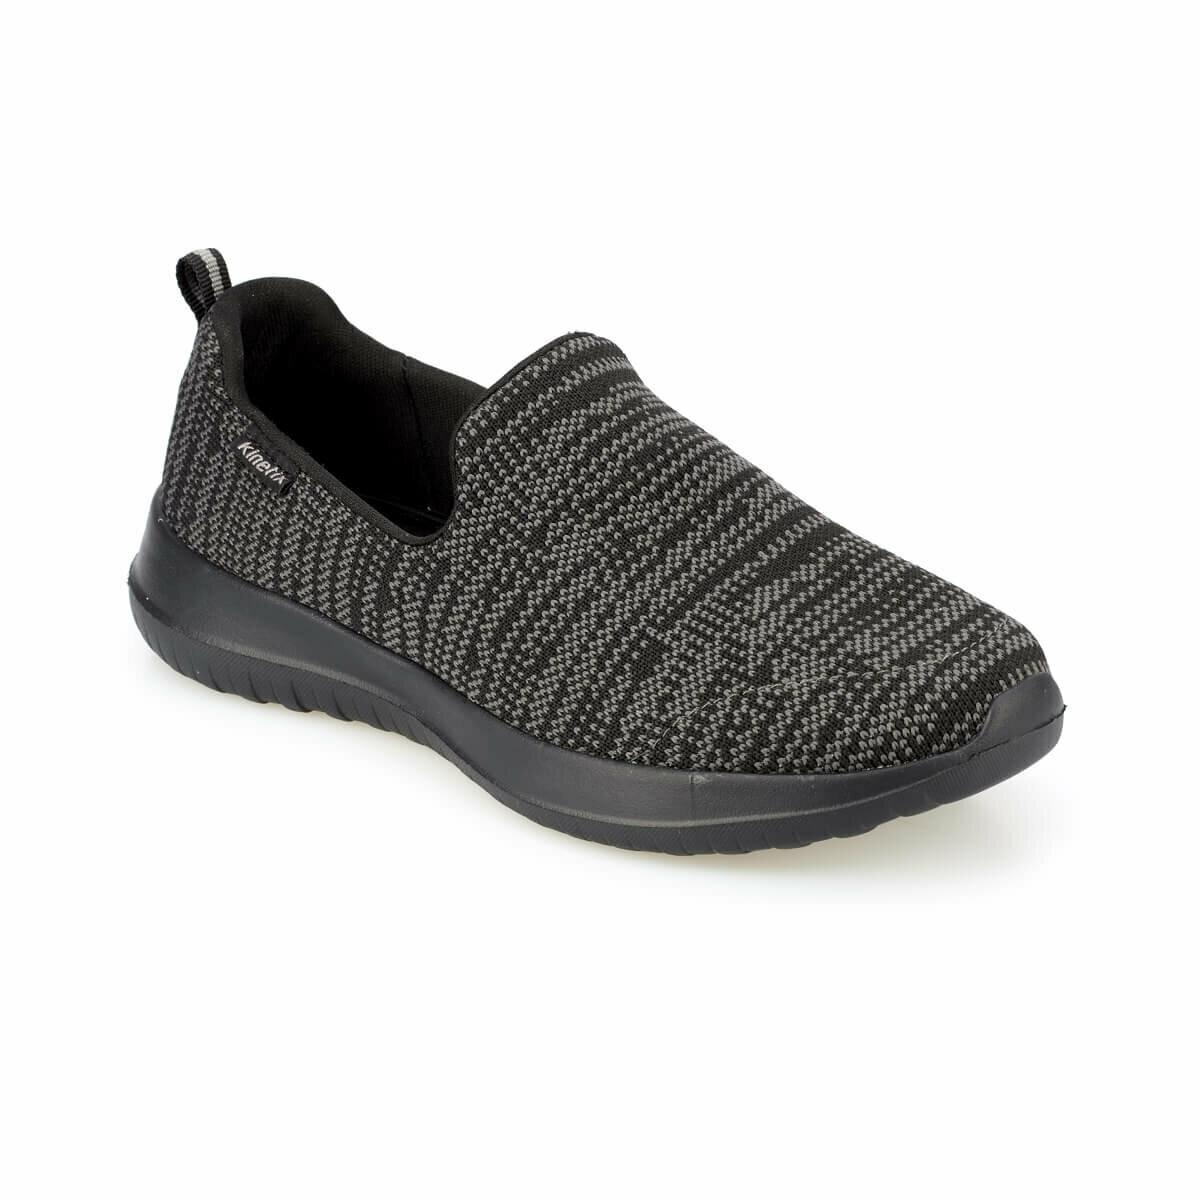 FLO FURY W Black Women Comfort Shoes KINETIX